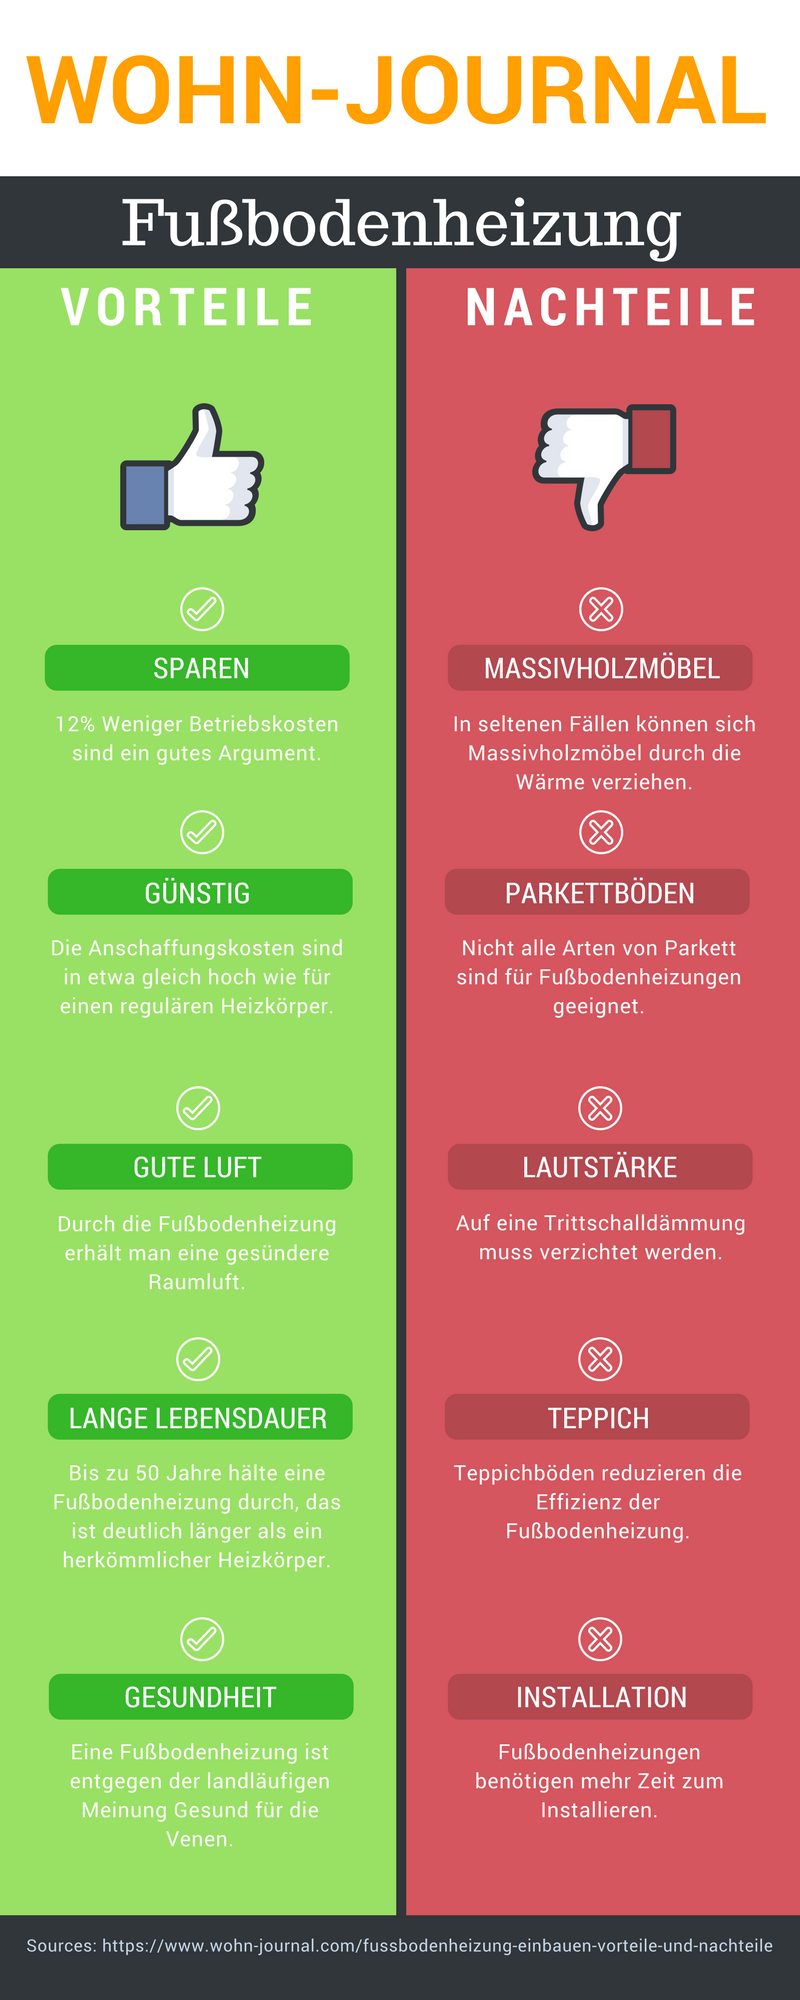 fußbodenheizung-infografik